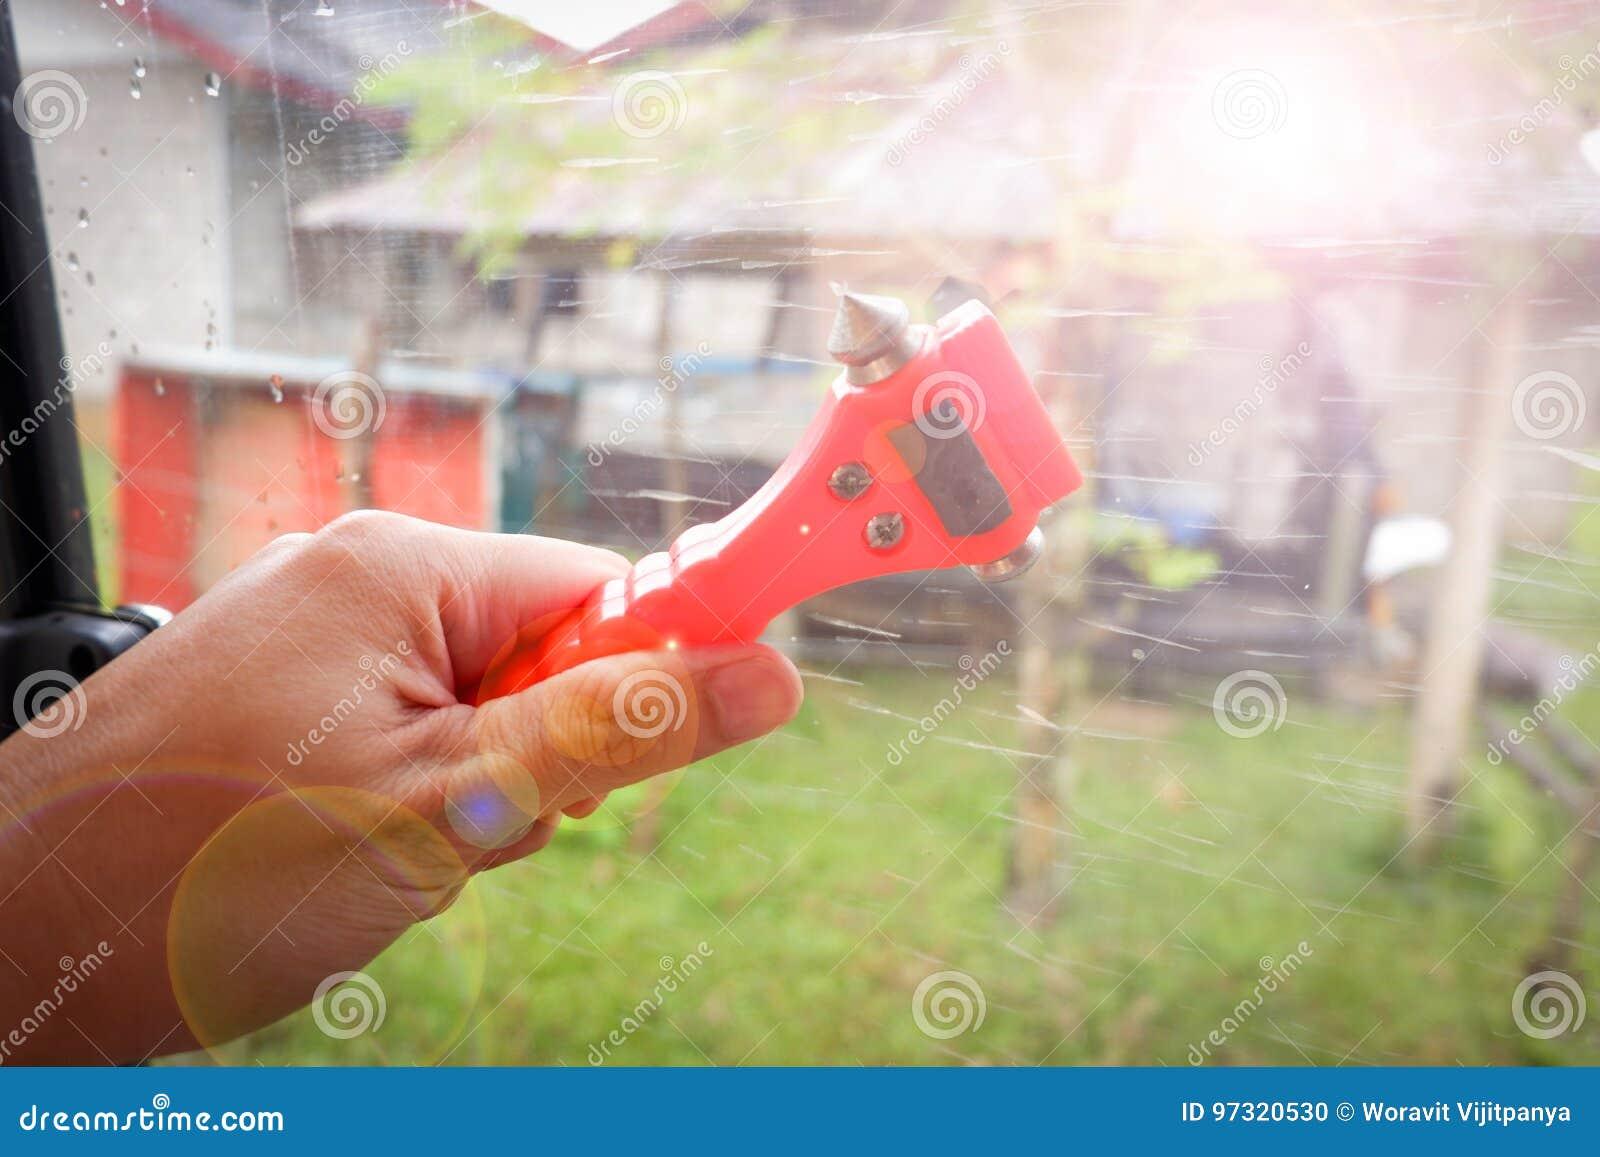 Tool smash the window Auto glass